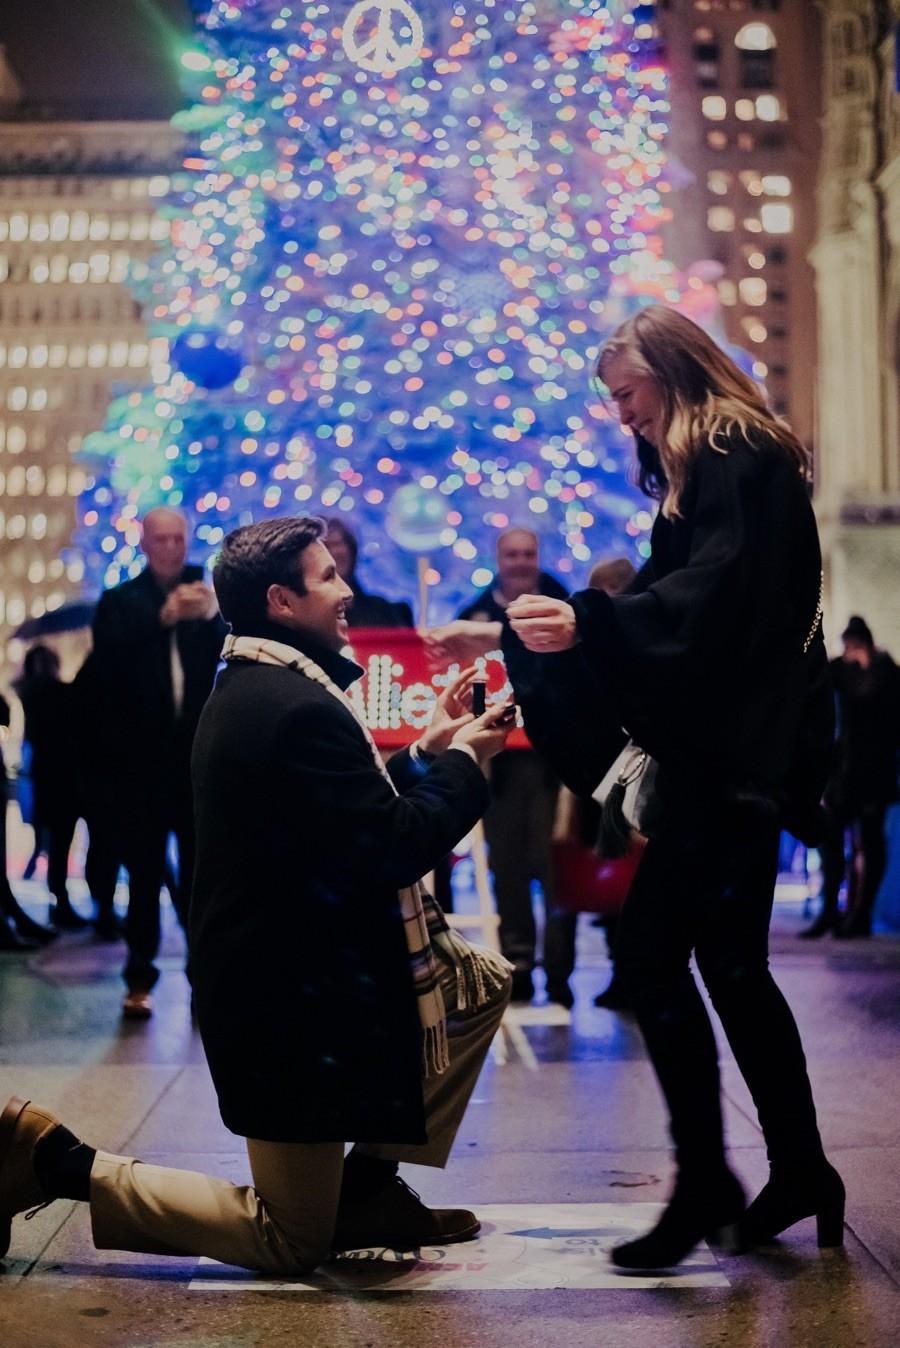 macys christmas tree proposal